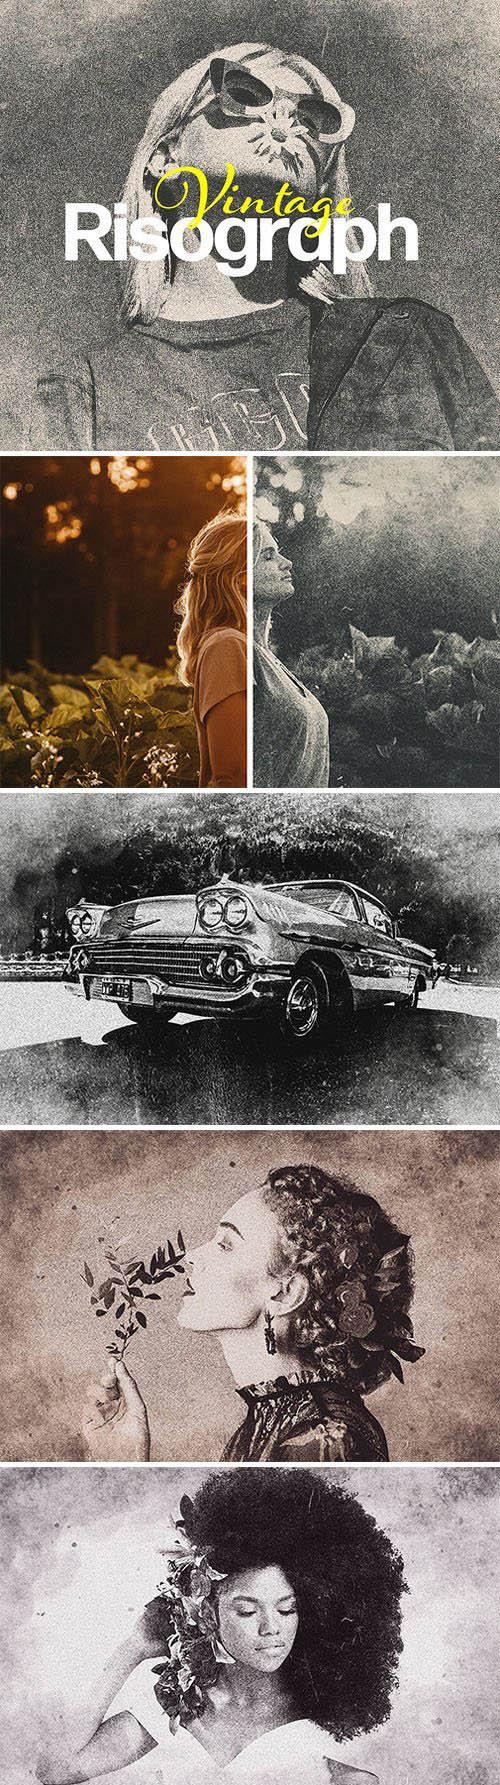 Vintage Risograph - Photoshop Photo Effect Template